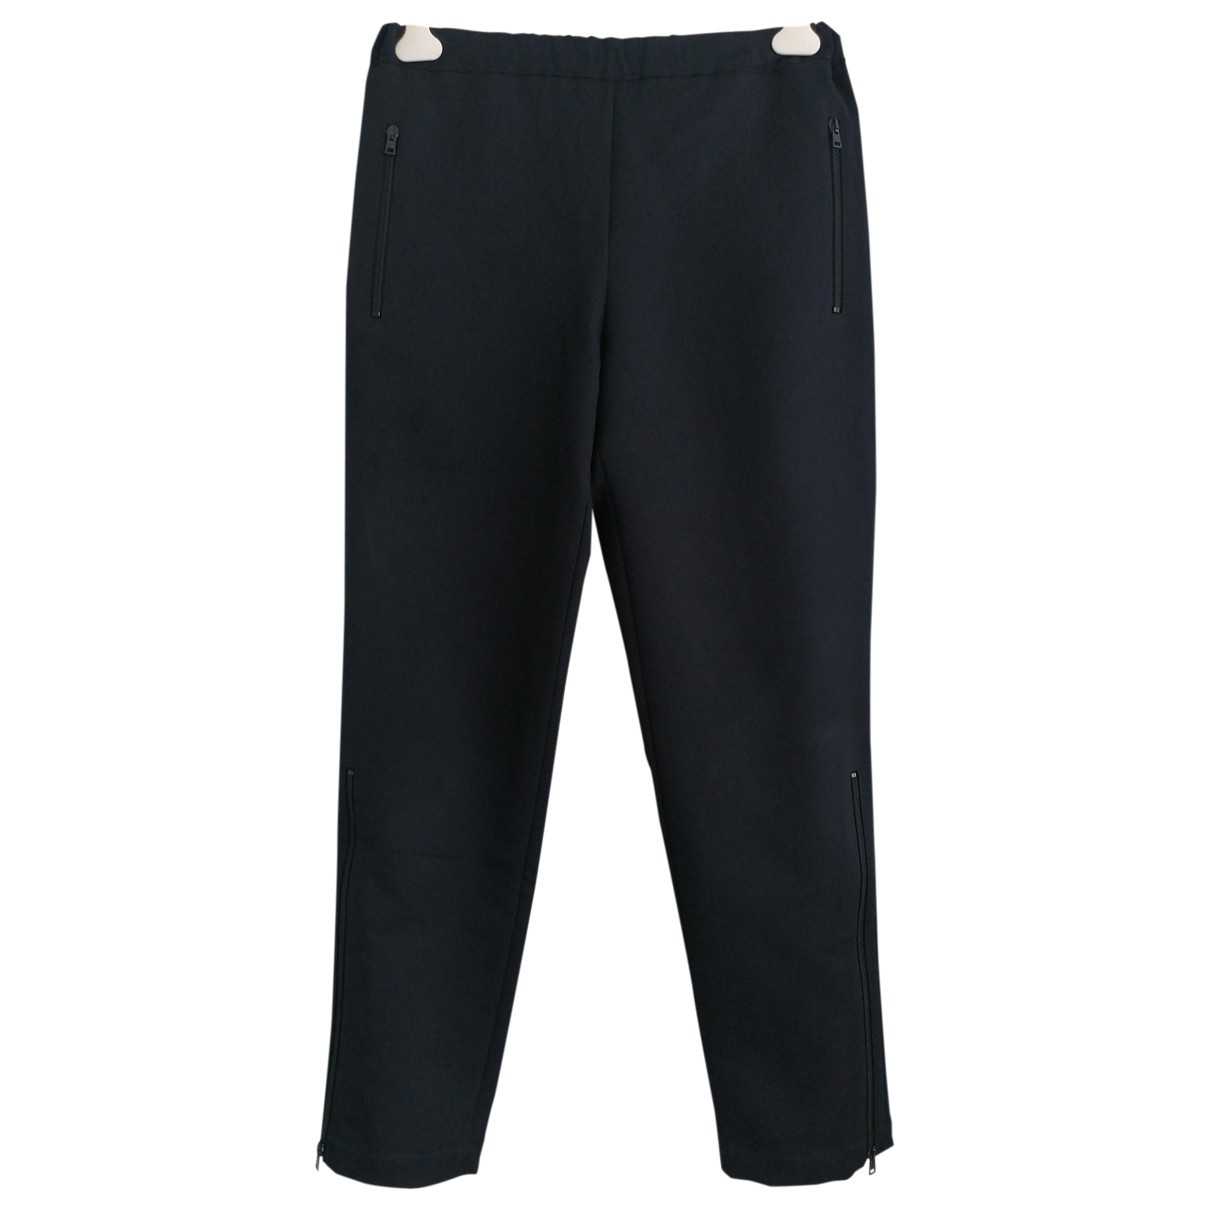 Pantalones en Poliester Marino Marni